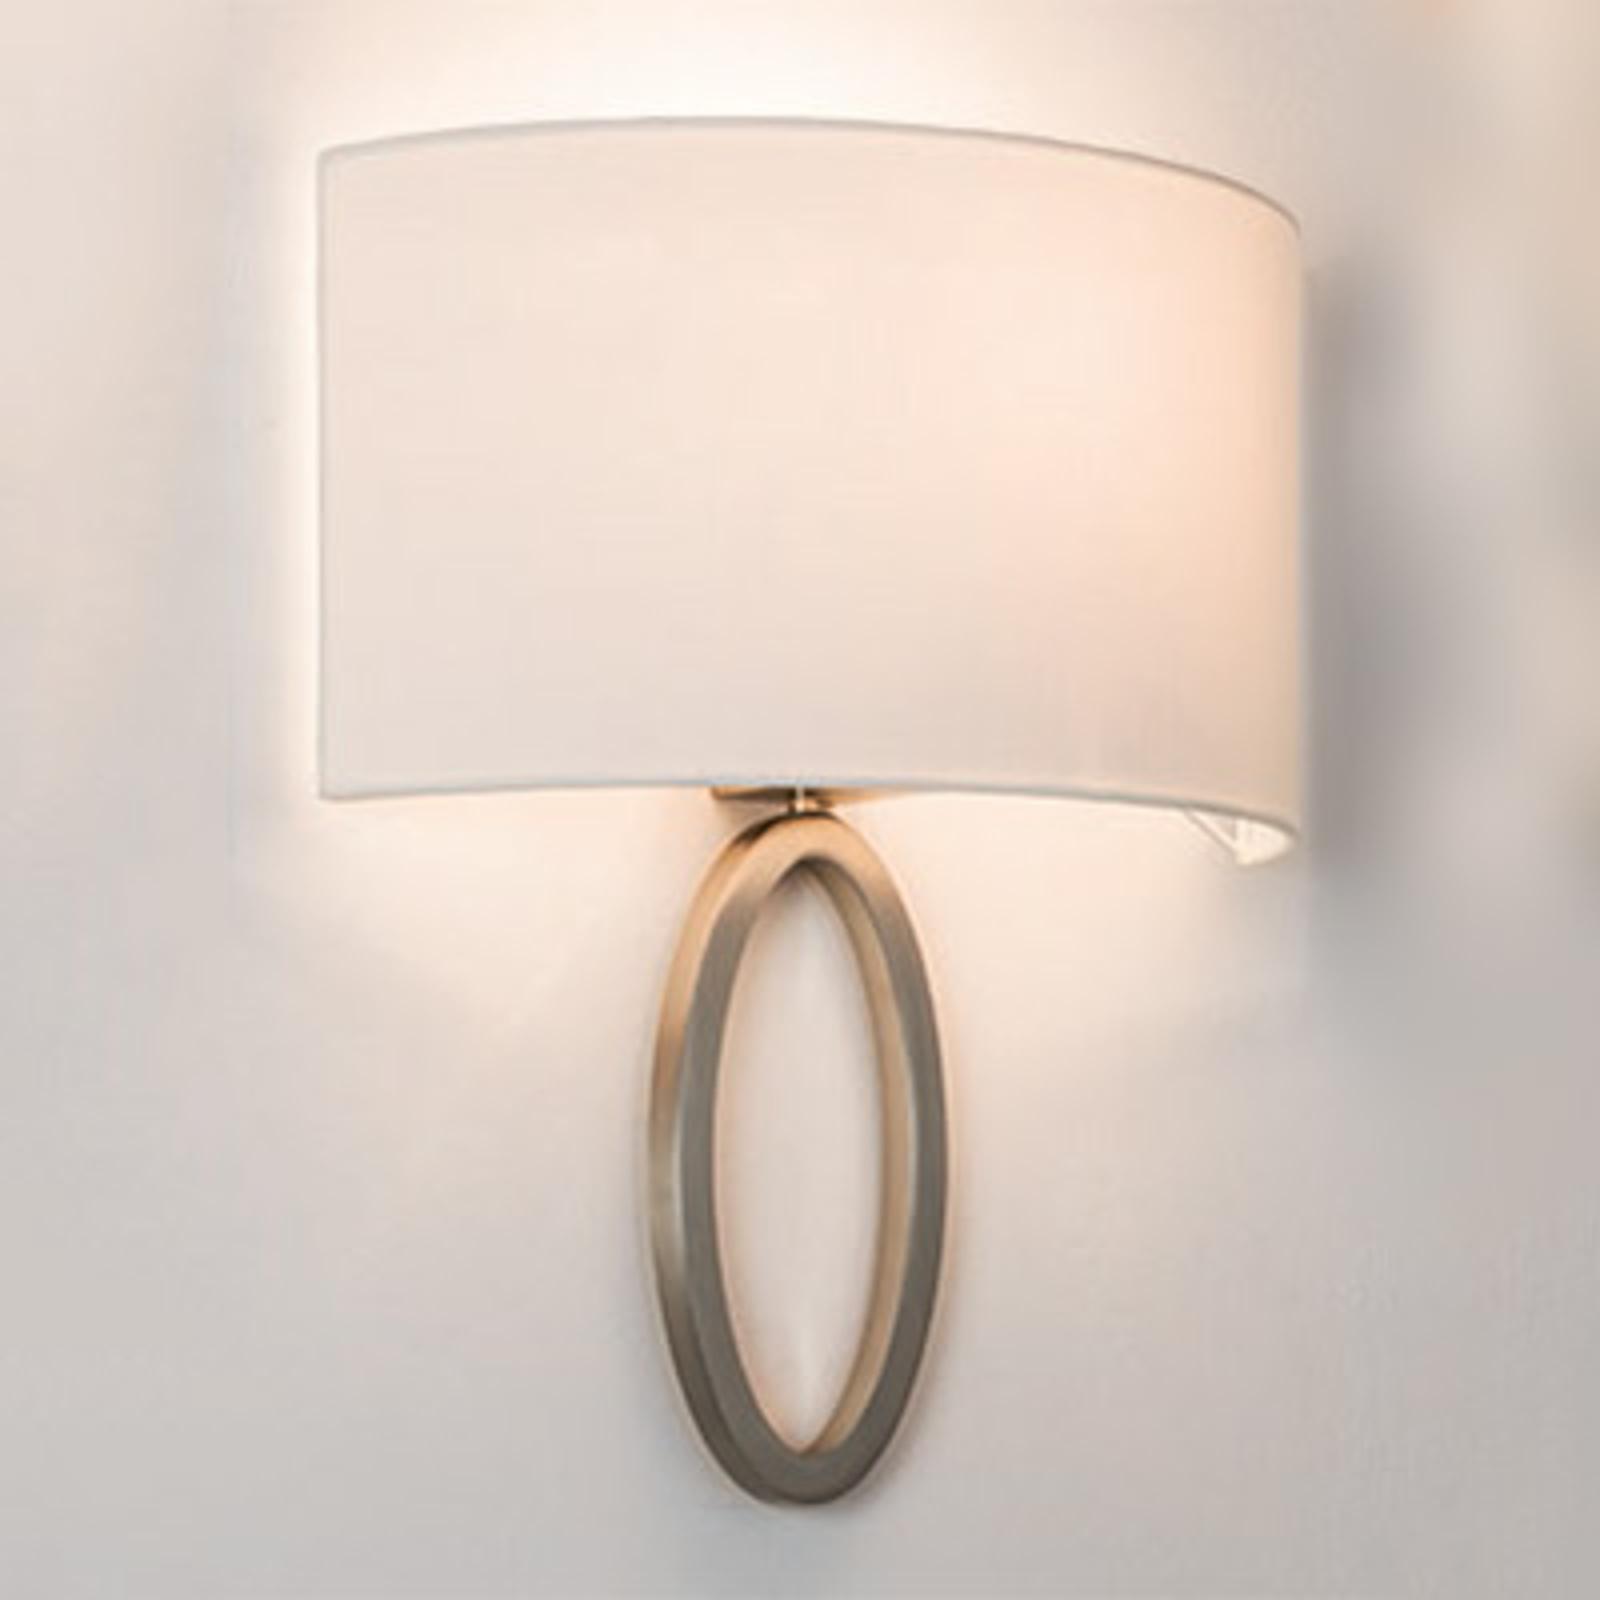 Elegant fabric wall light Lima in white_1020521_1